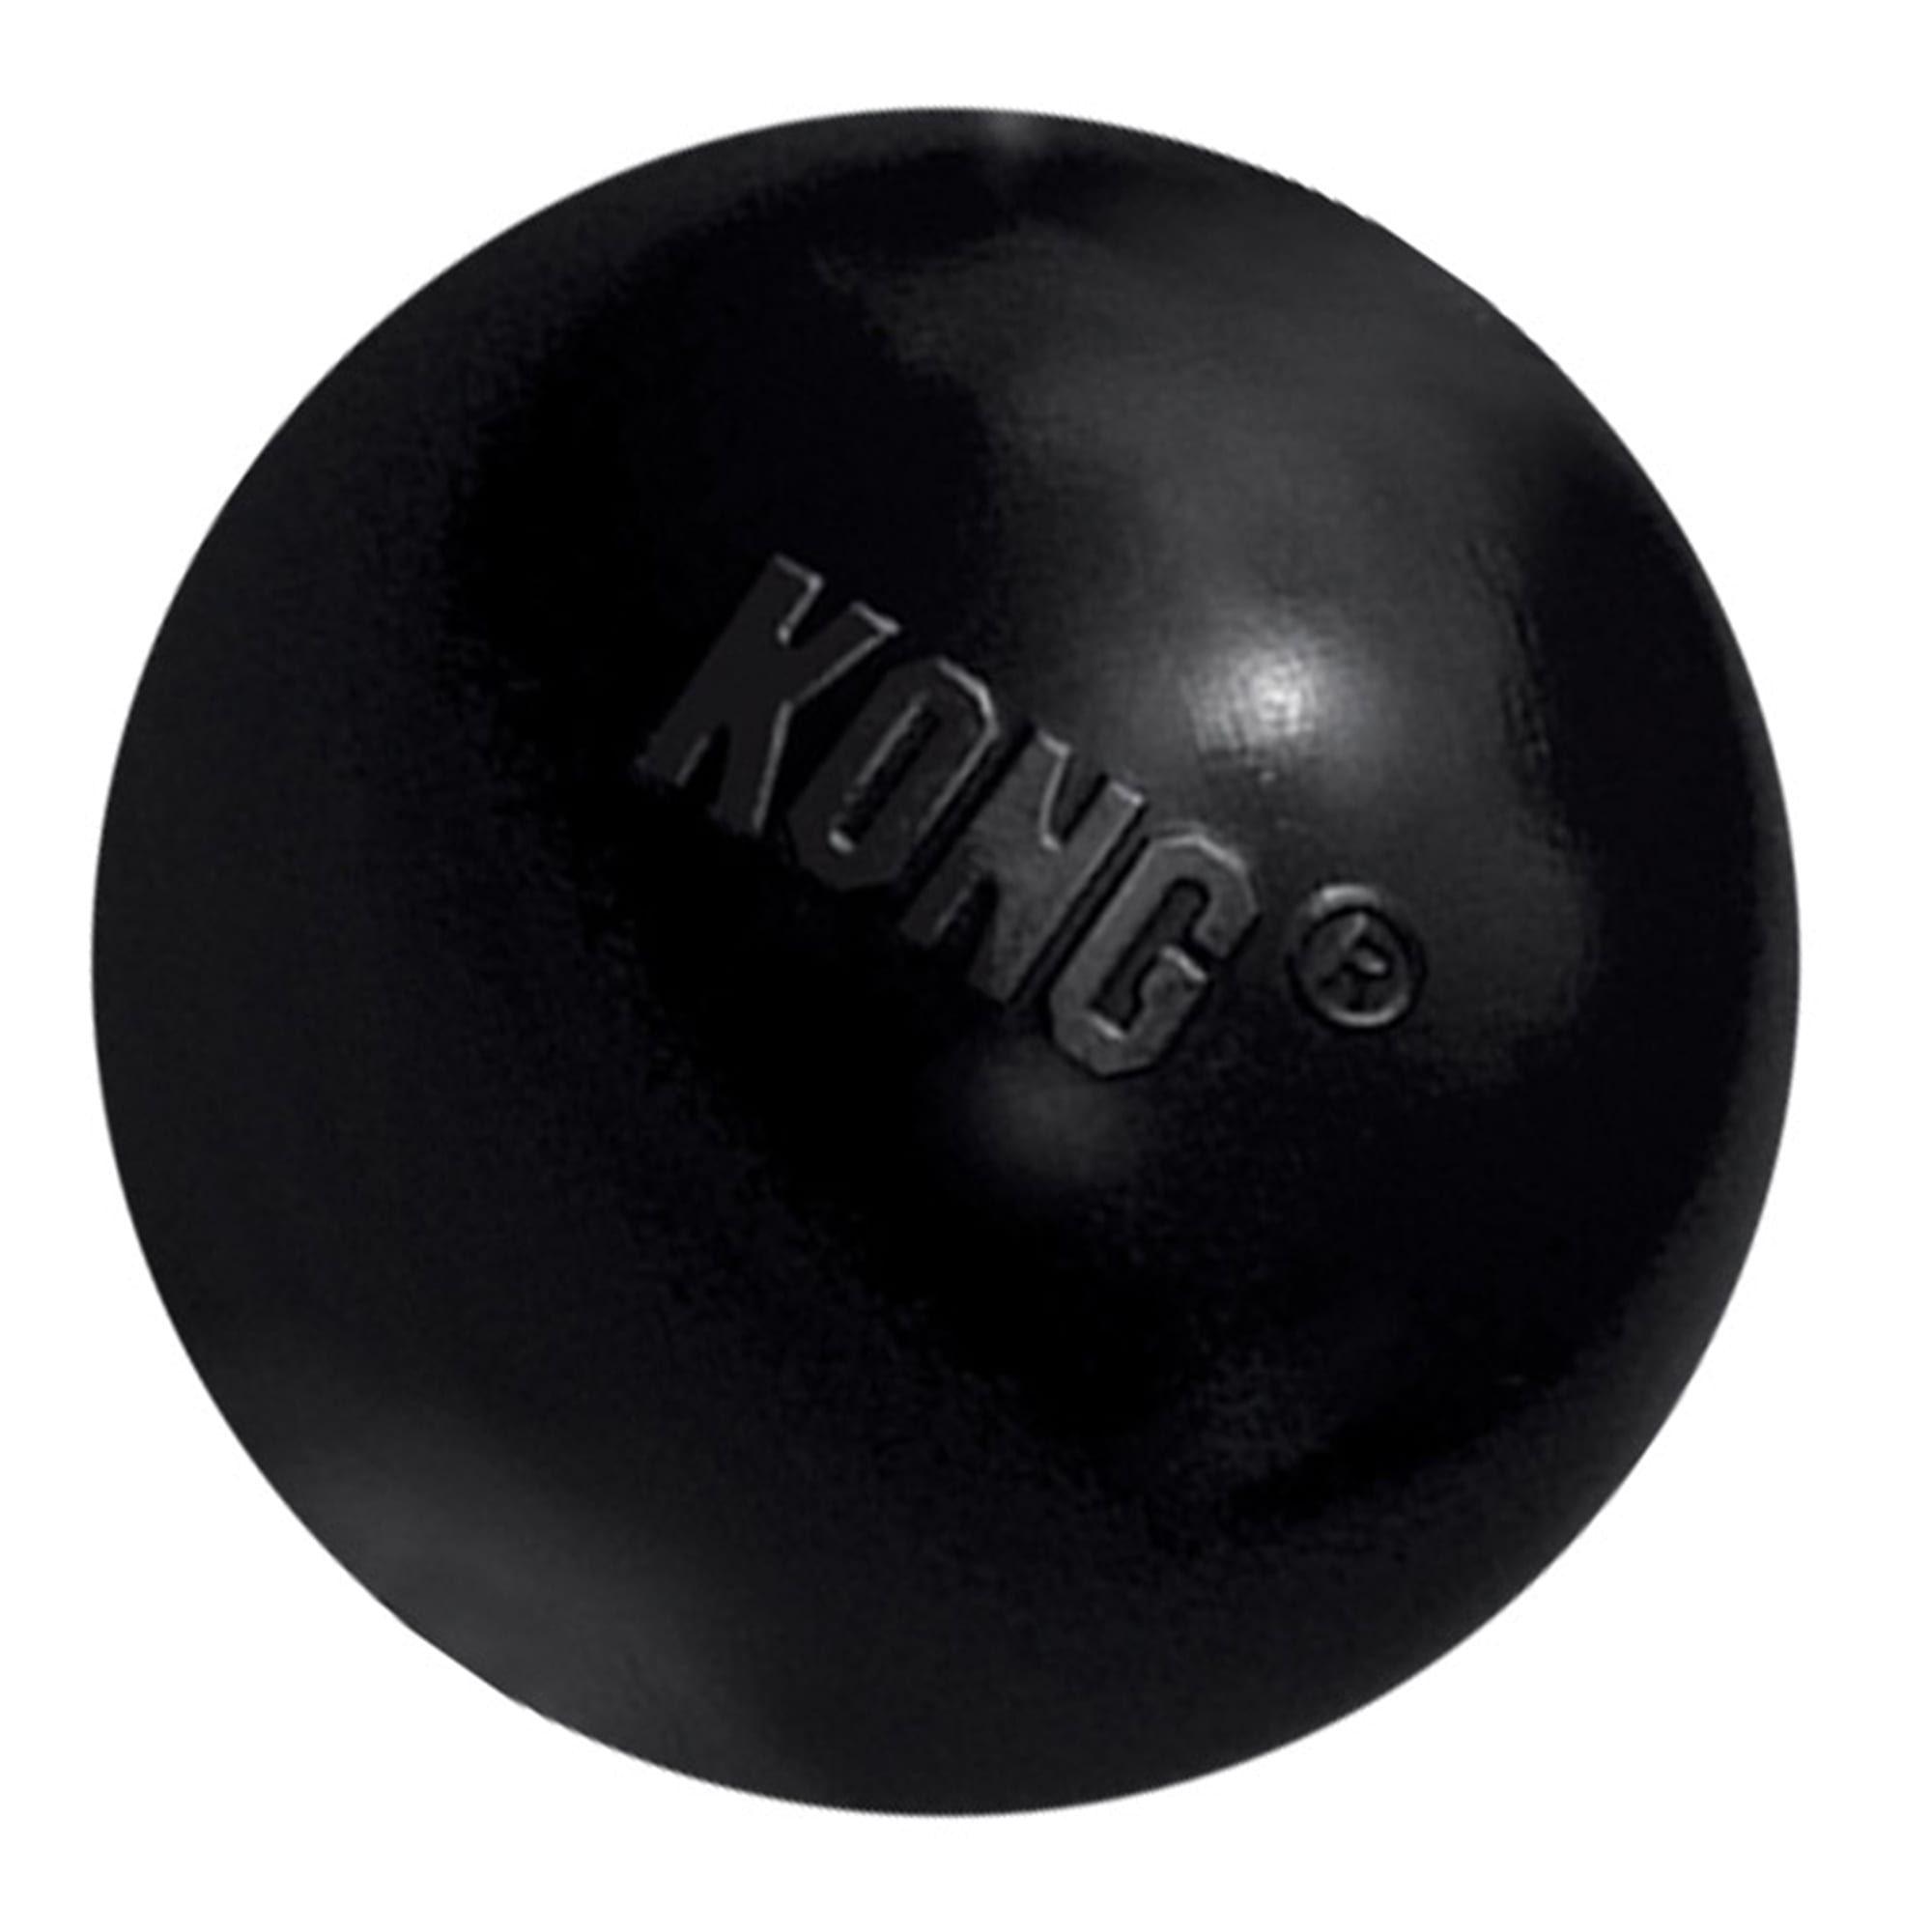 Kong Extreme Ball Dog Toy Large In 2020 Tough Dog Toys Dog